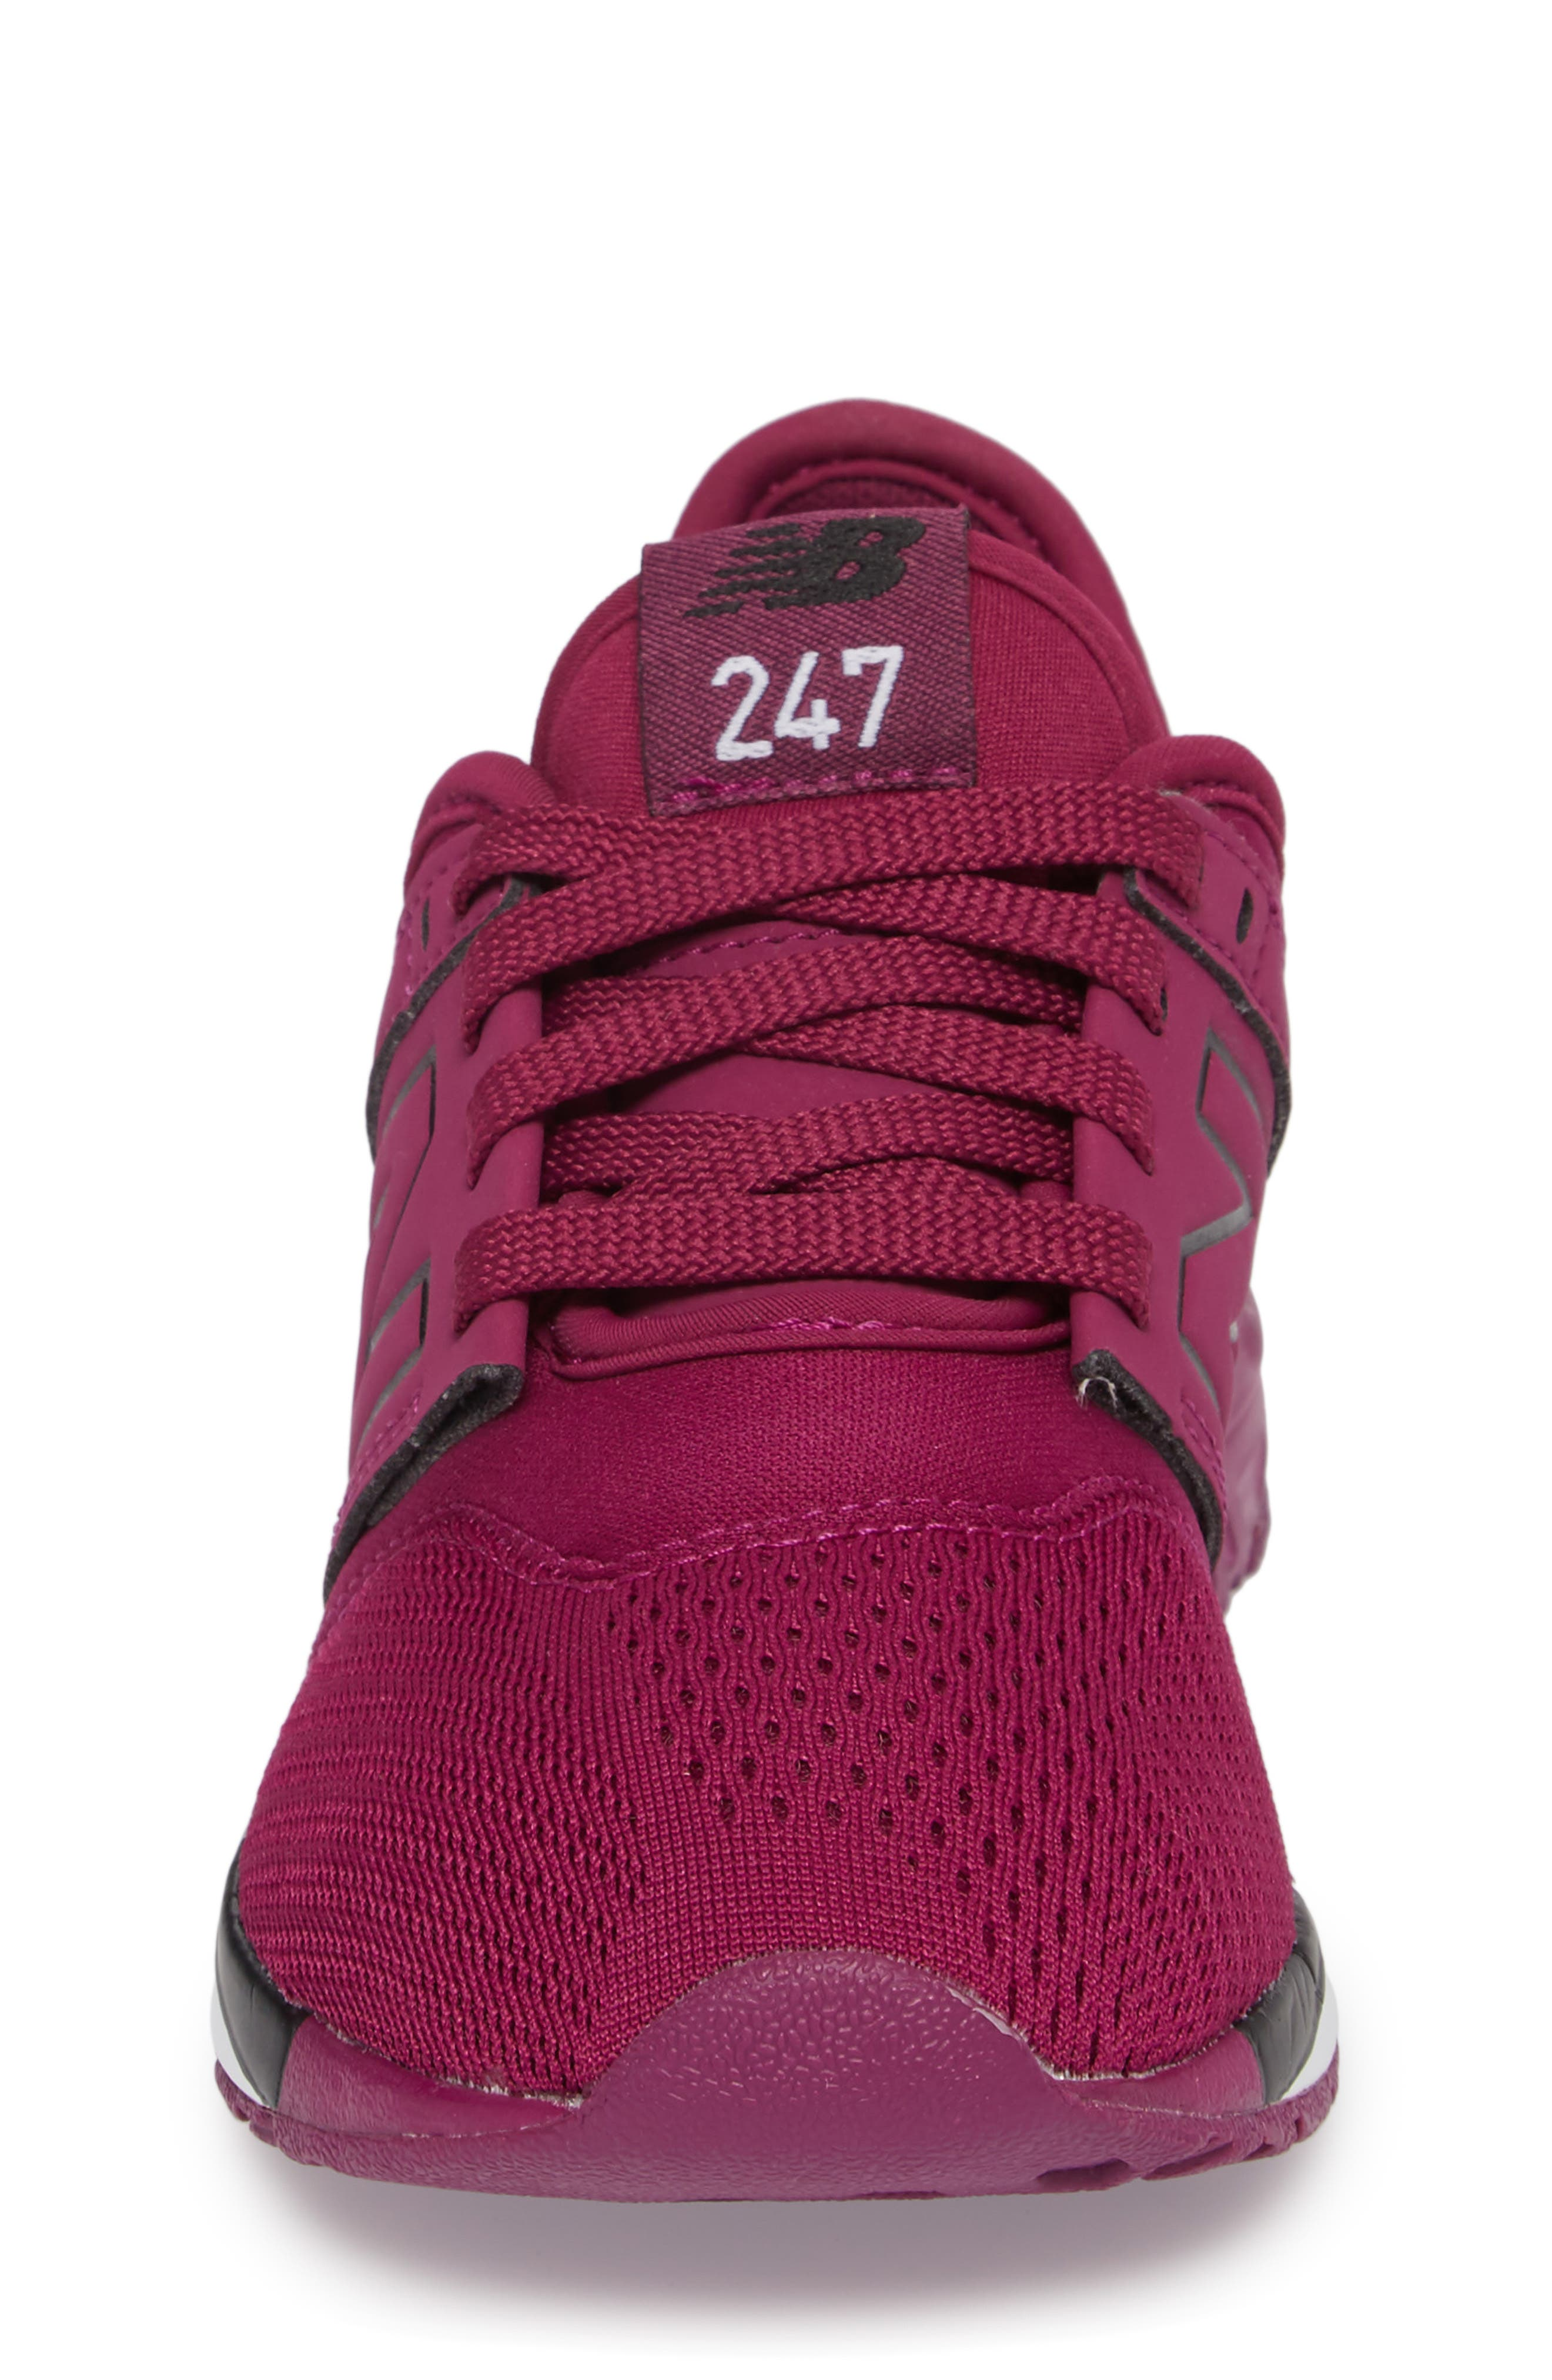 Alternate Image 4  - New Balance 247 Sport Sneaker (Baby, Walker, Toddler, Little Kid & Big Kid)